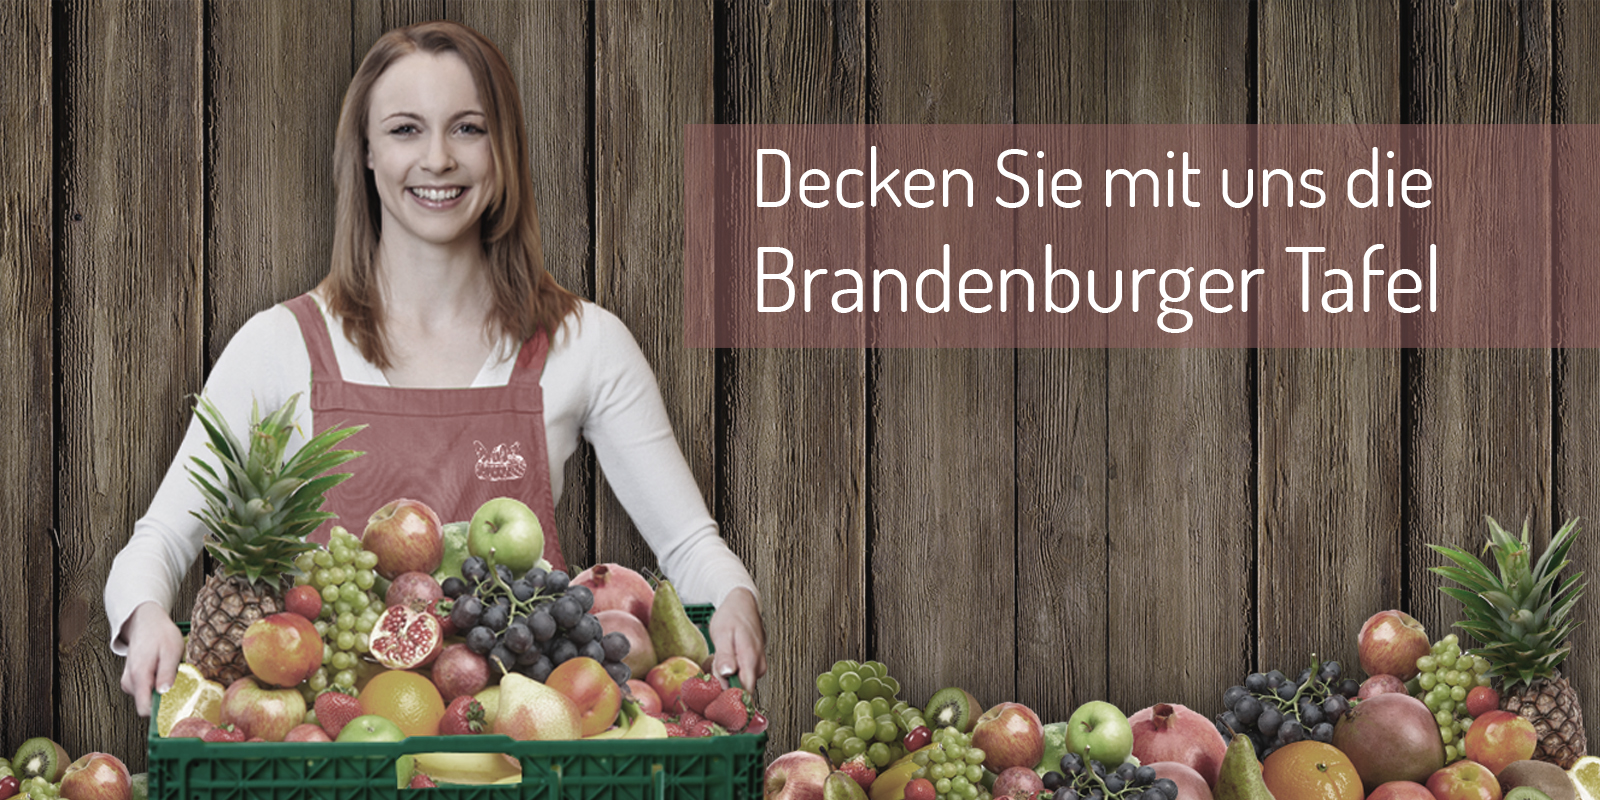 Brandenburger-Tafel